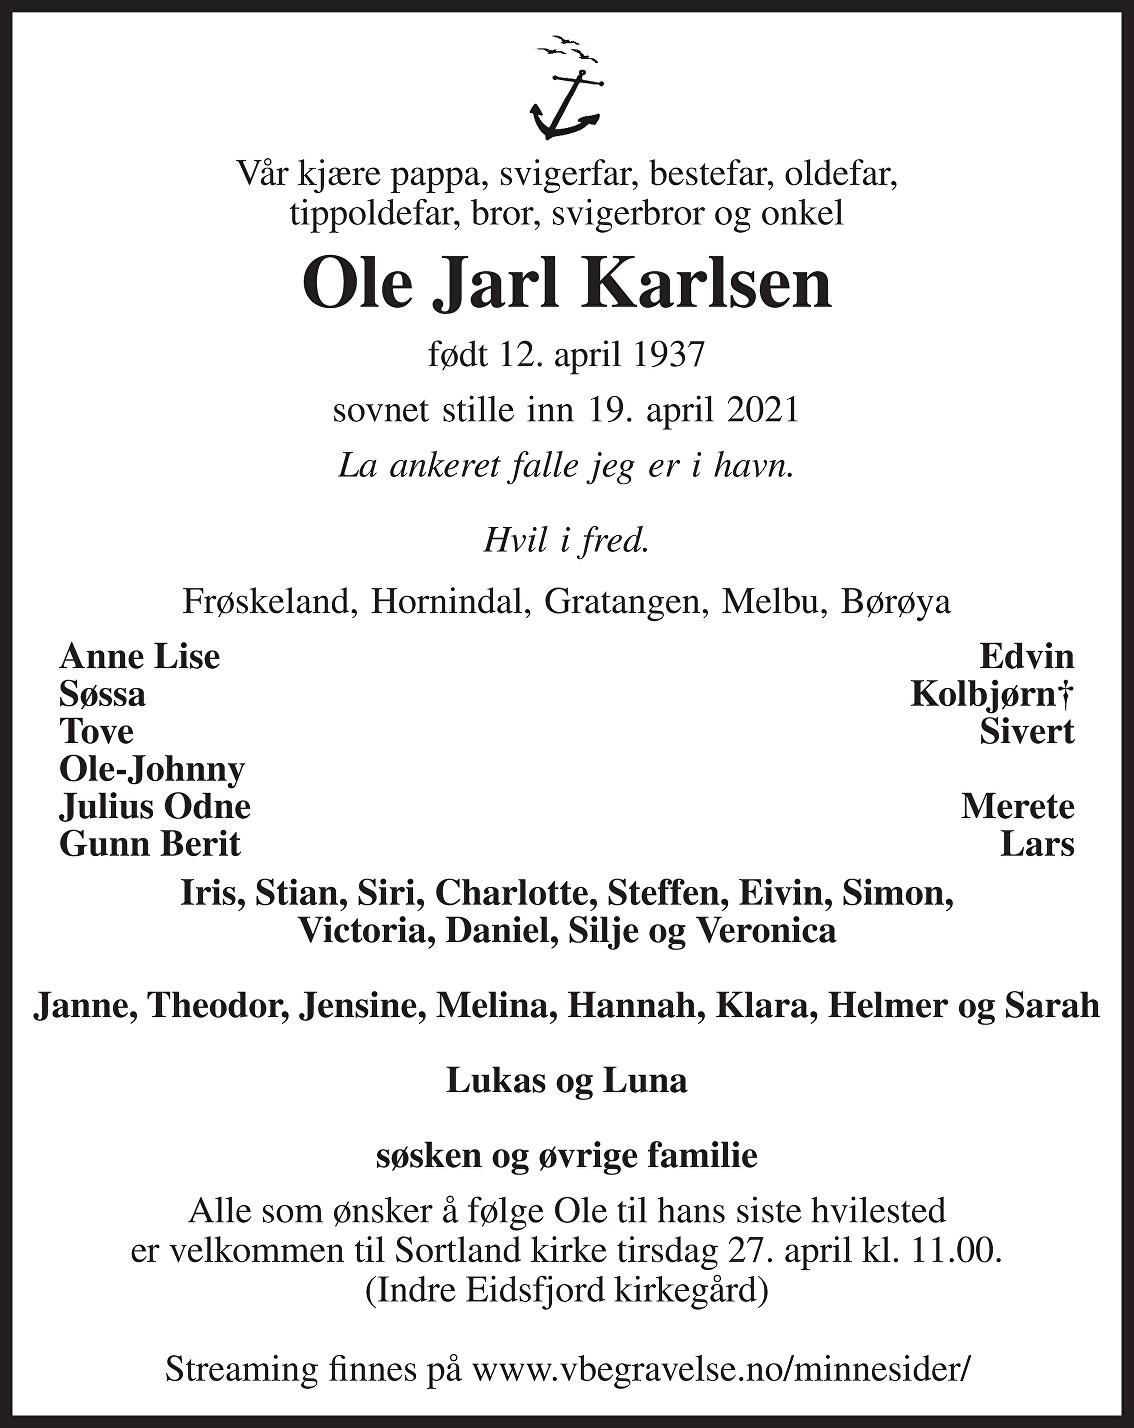 Ole Jarl Karlsen Dødsannonse